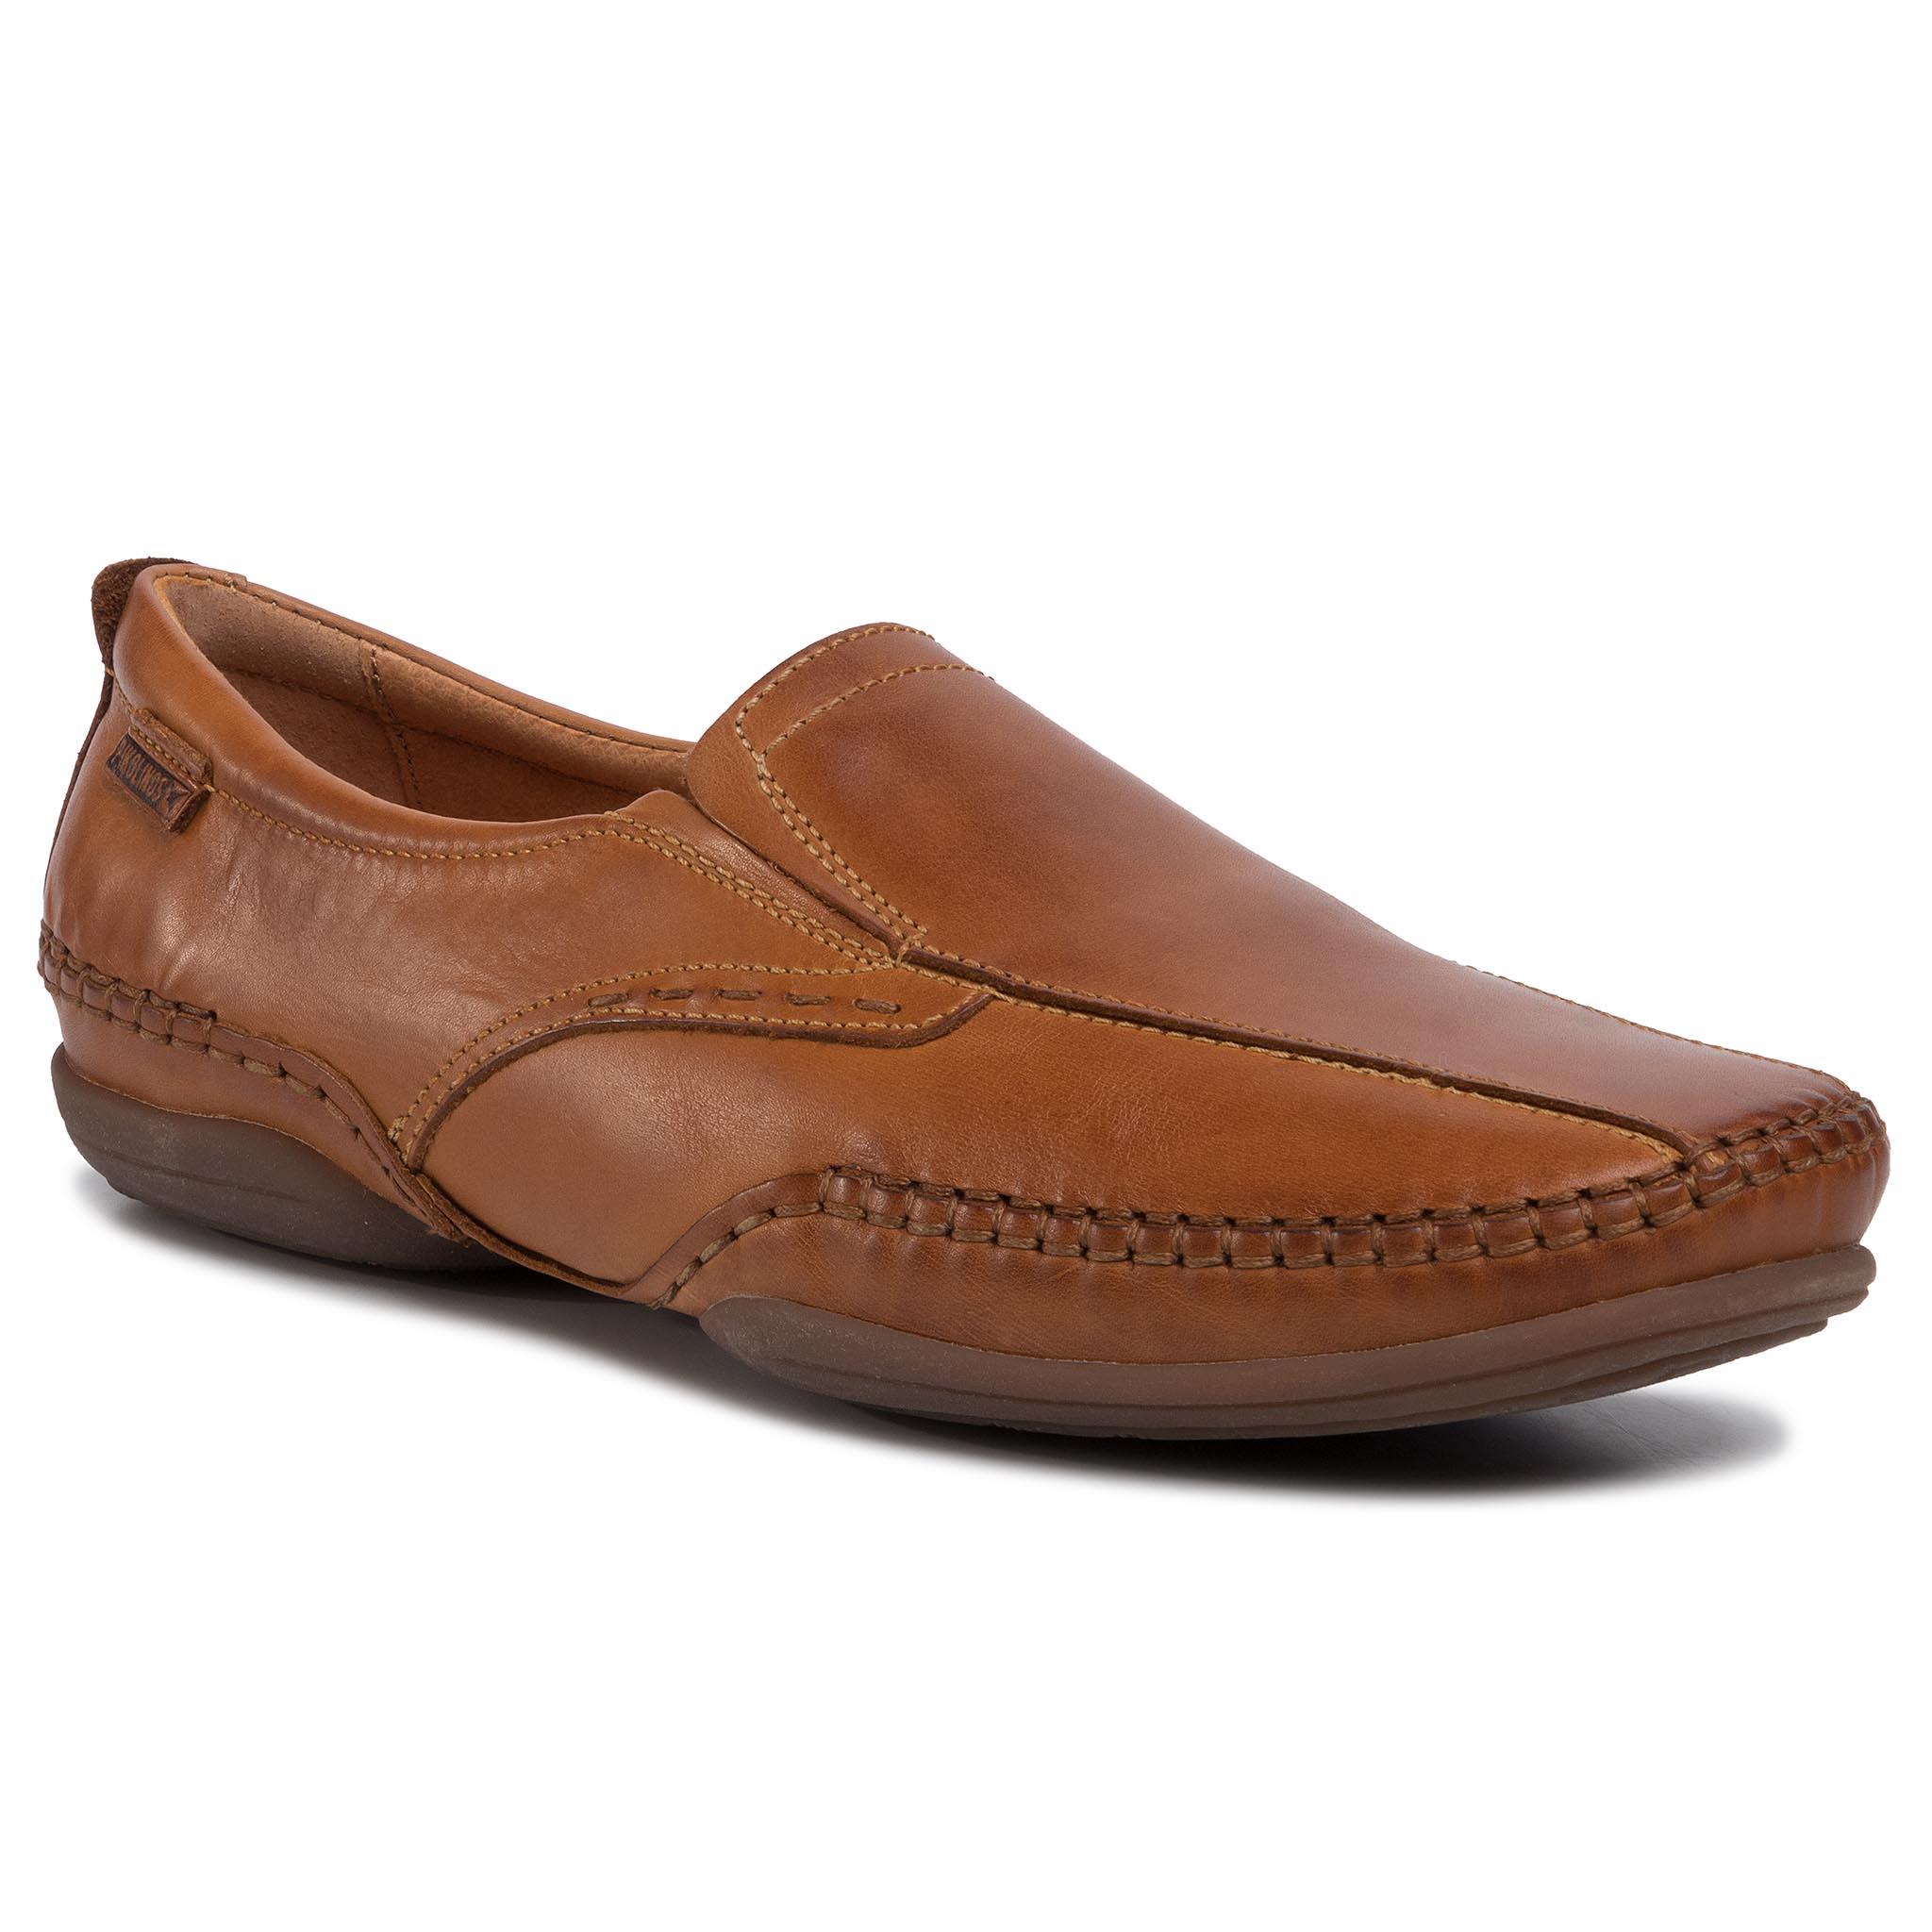 Férfi bőrcipő t318 barna